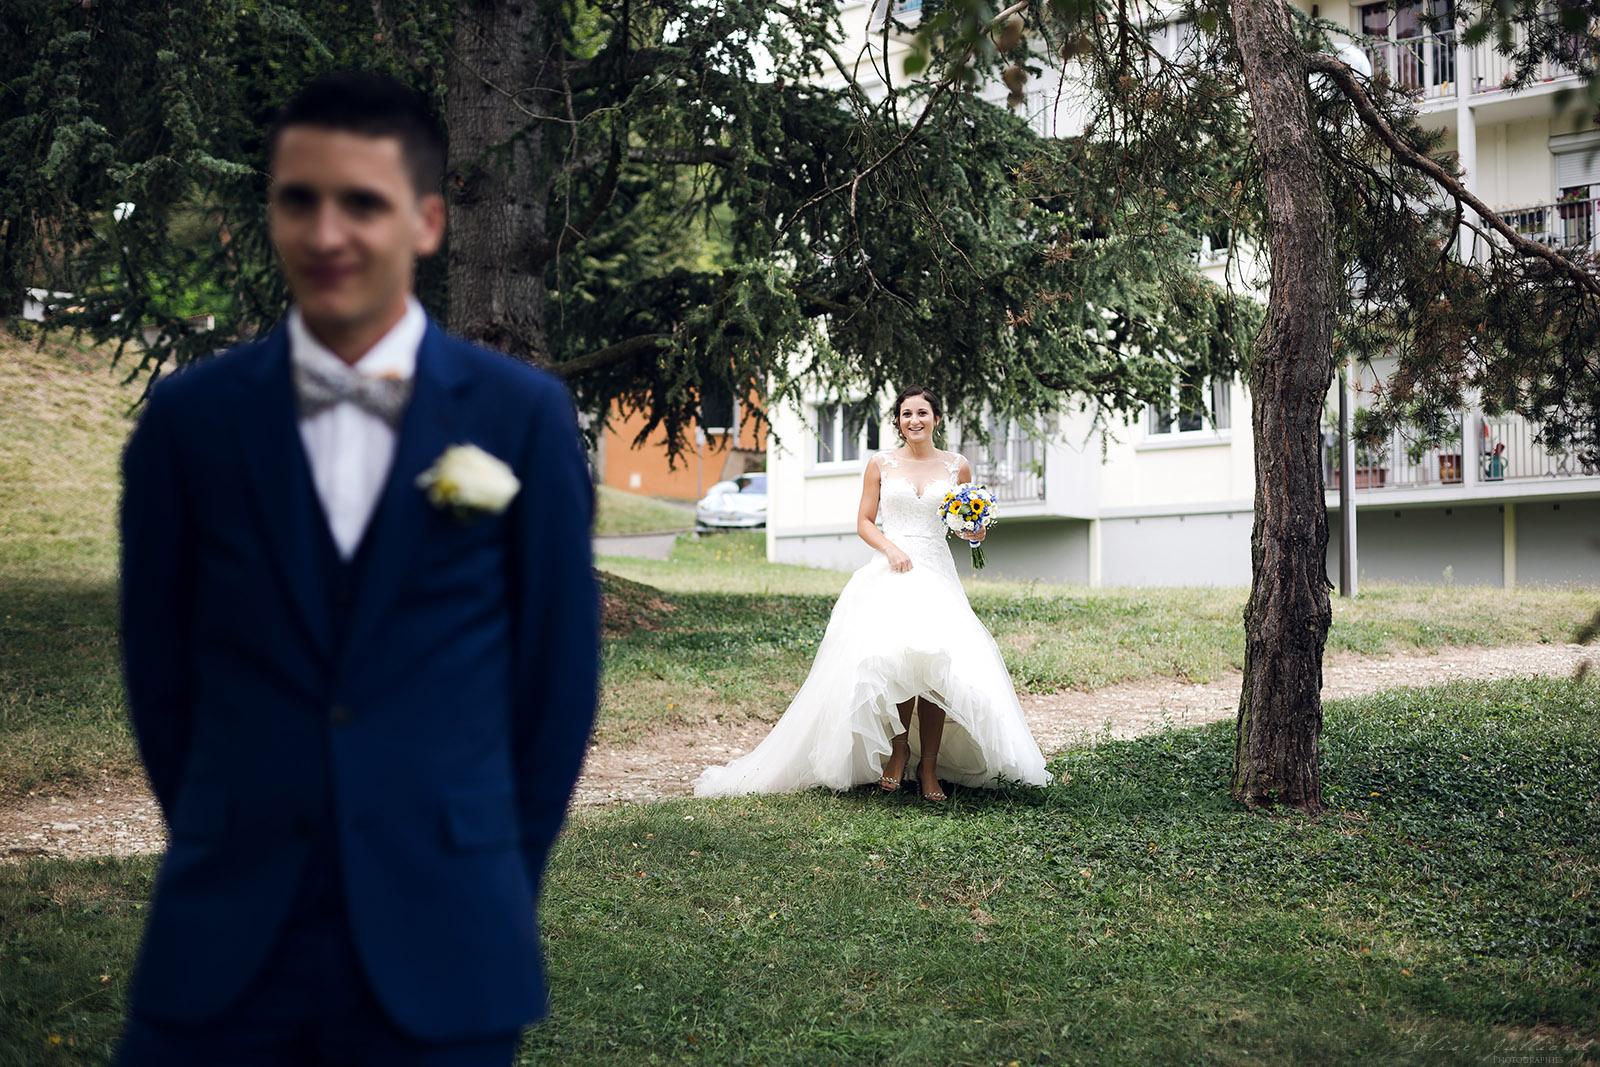 photographe-mariage-wedding-photographer-lyon-auvergne-rhone-alpes-ain-beaujolais-domaine-du-passeloup-couple-reportage-elise-julliard-5